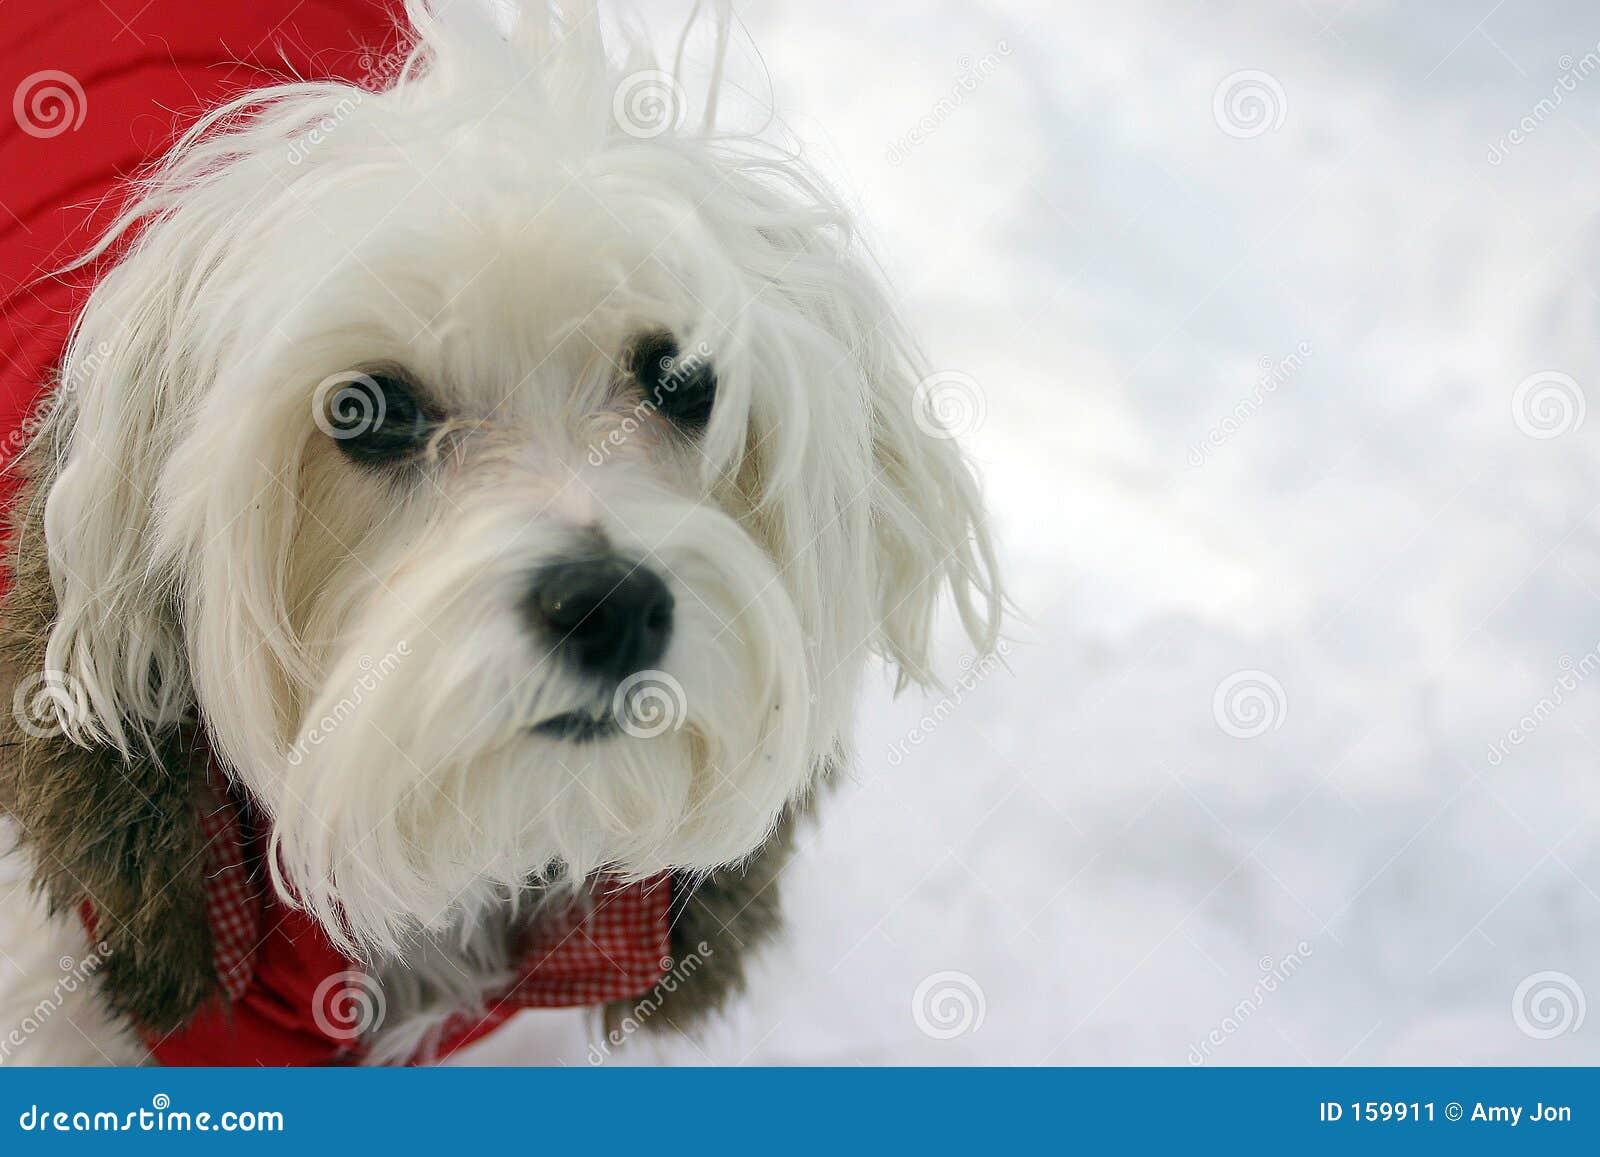 Maltese Dog in Winter Jacket